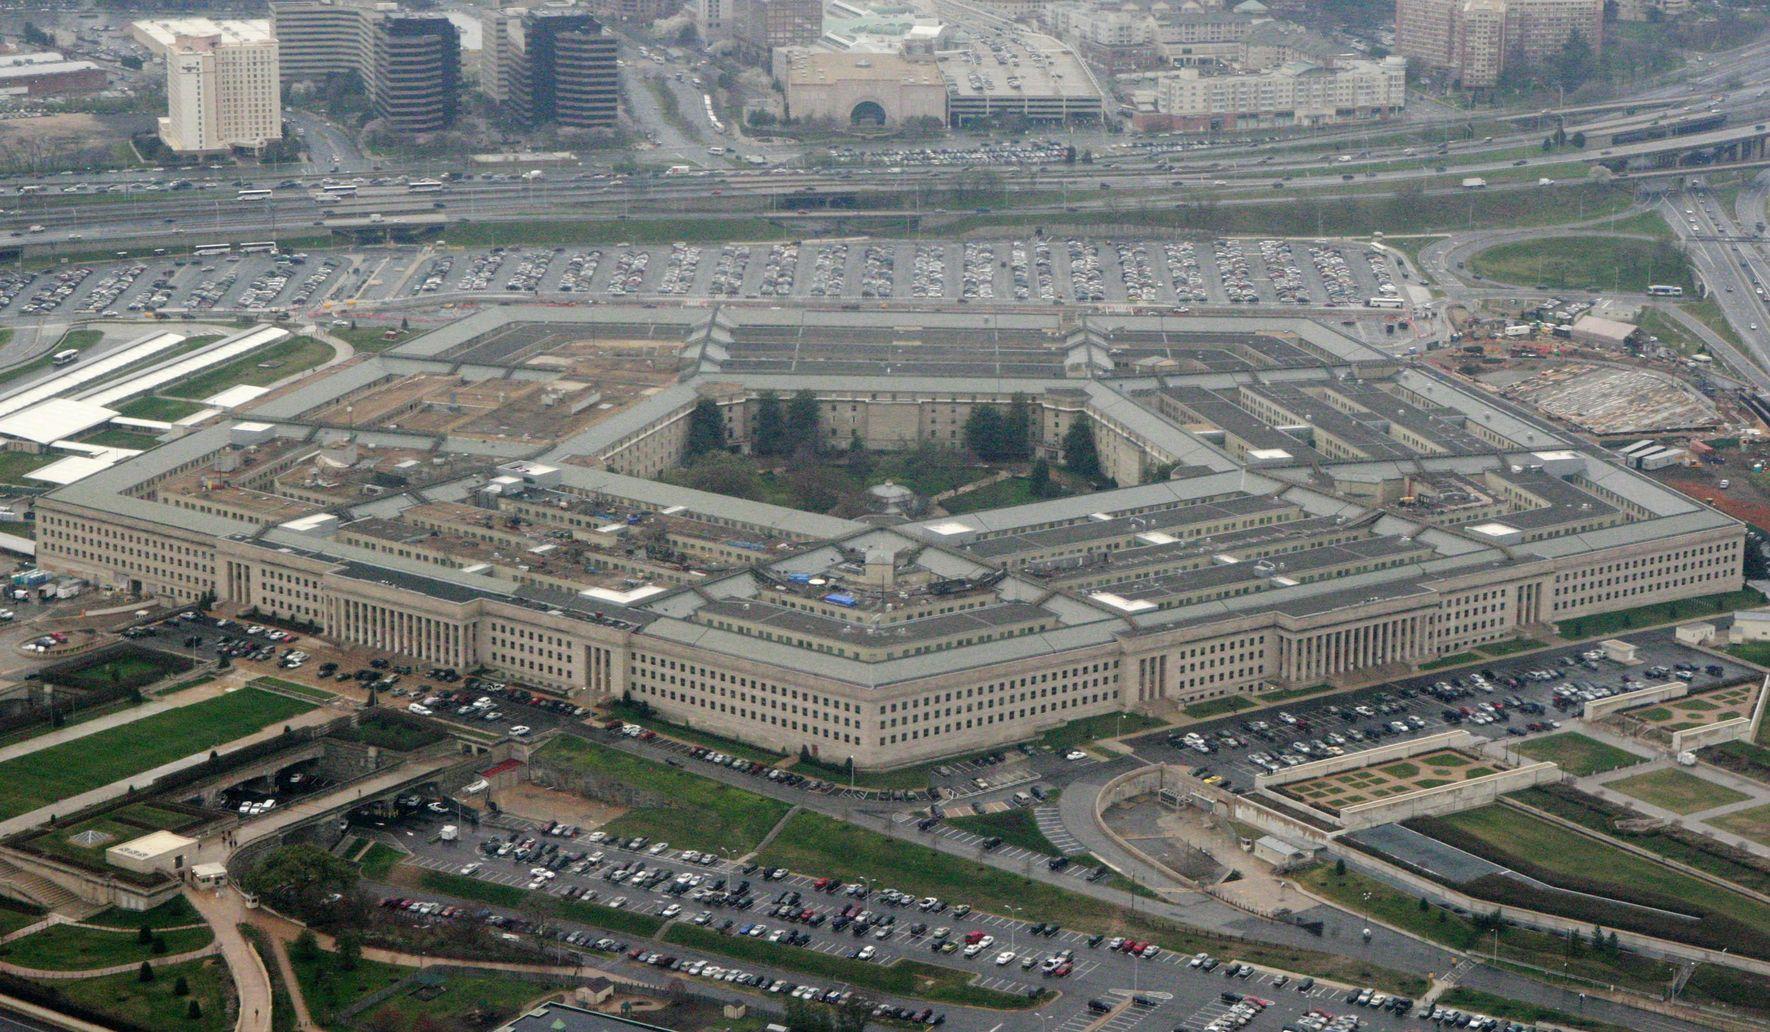 Pentagon takes over federal background checks